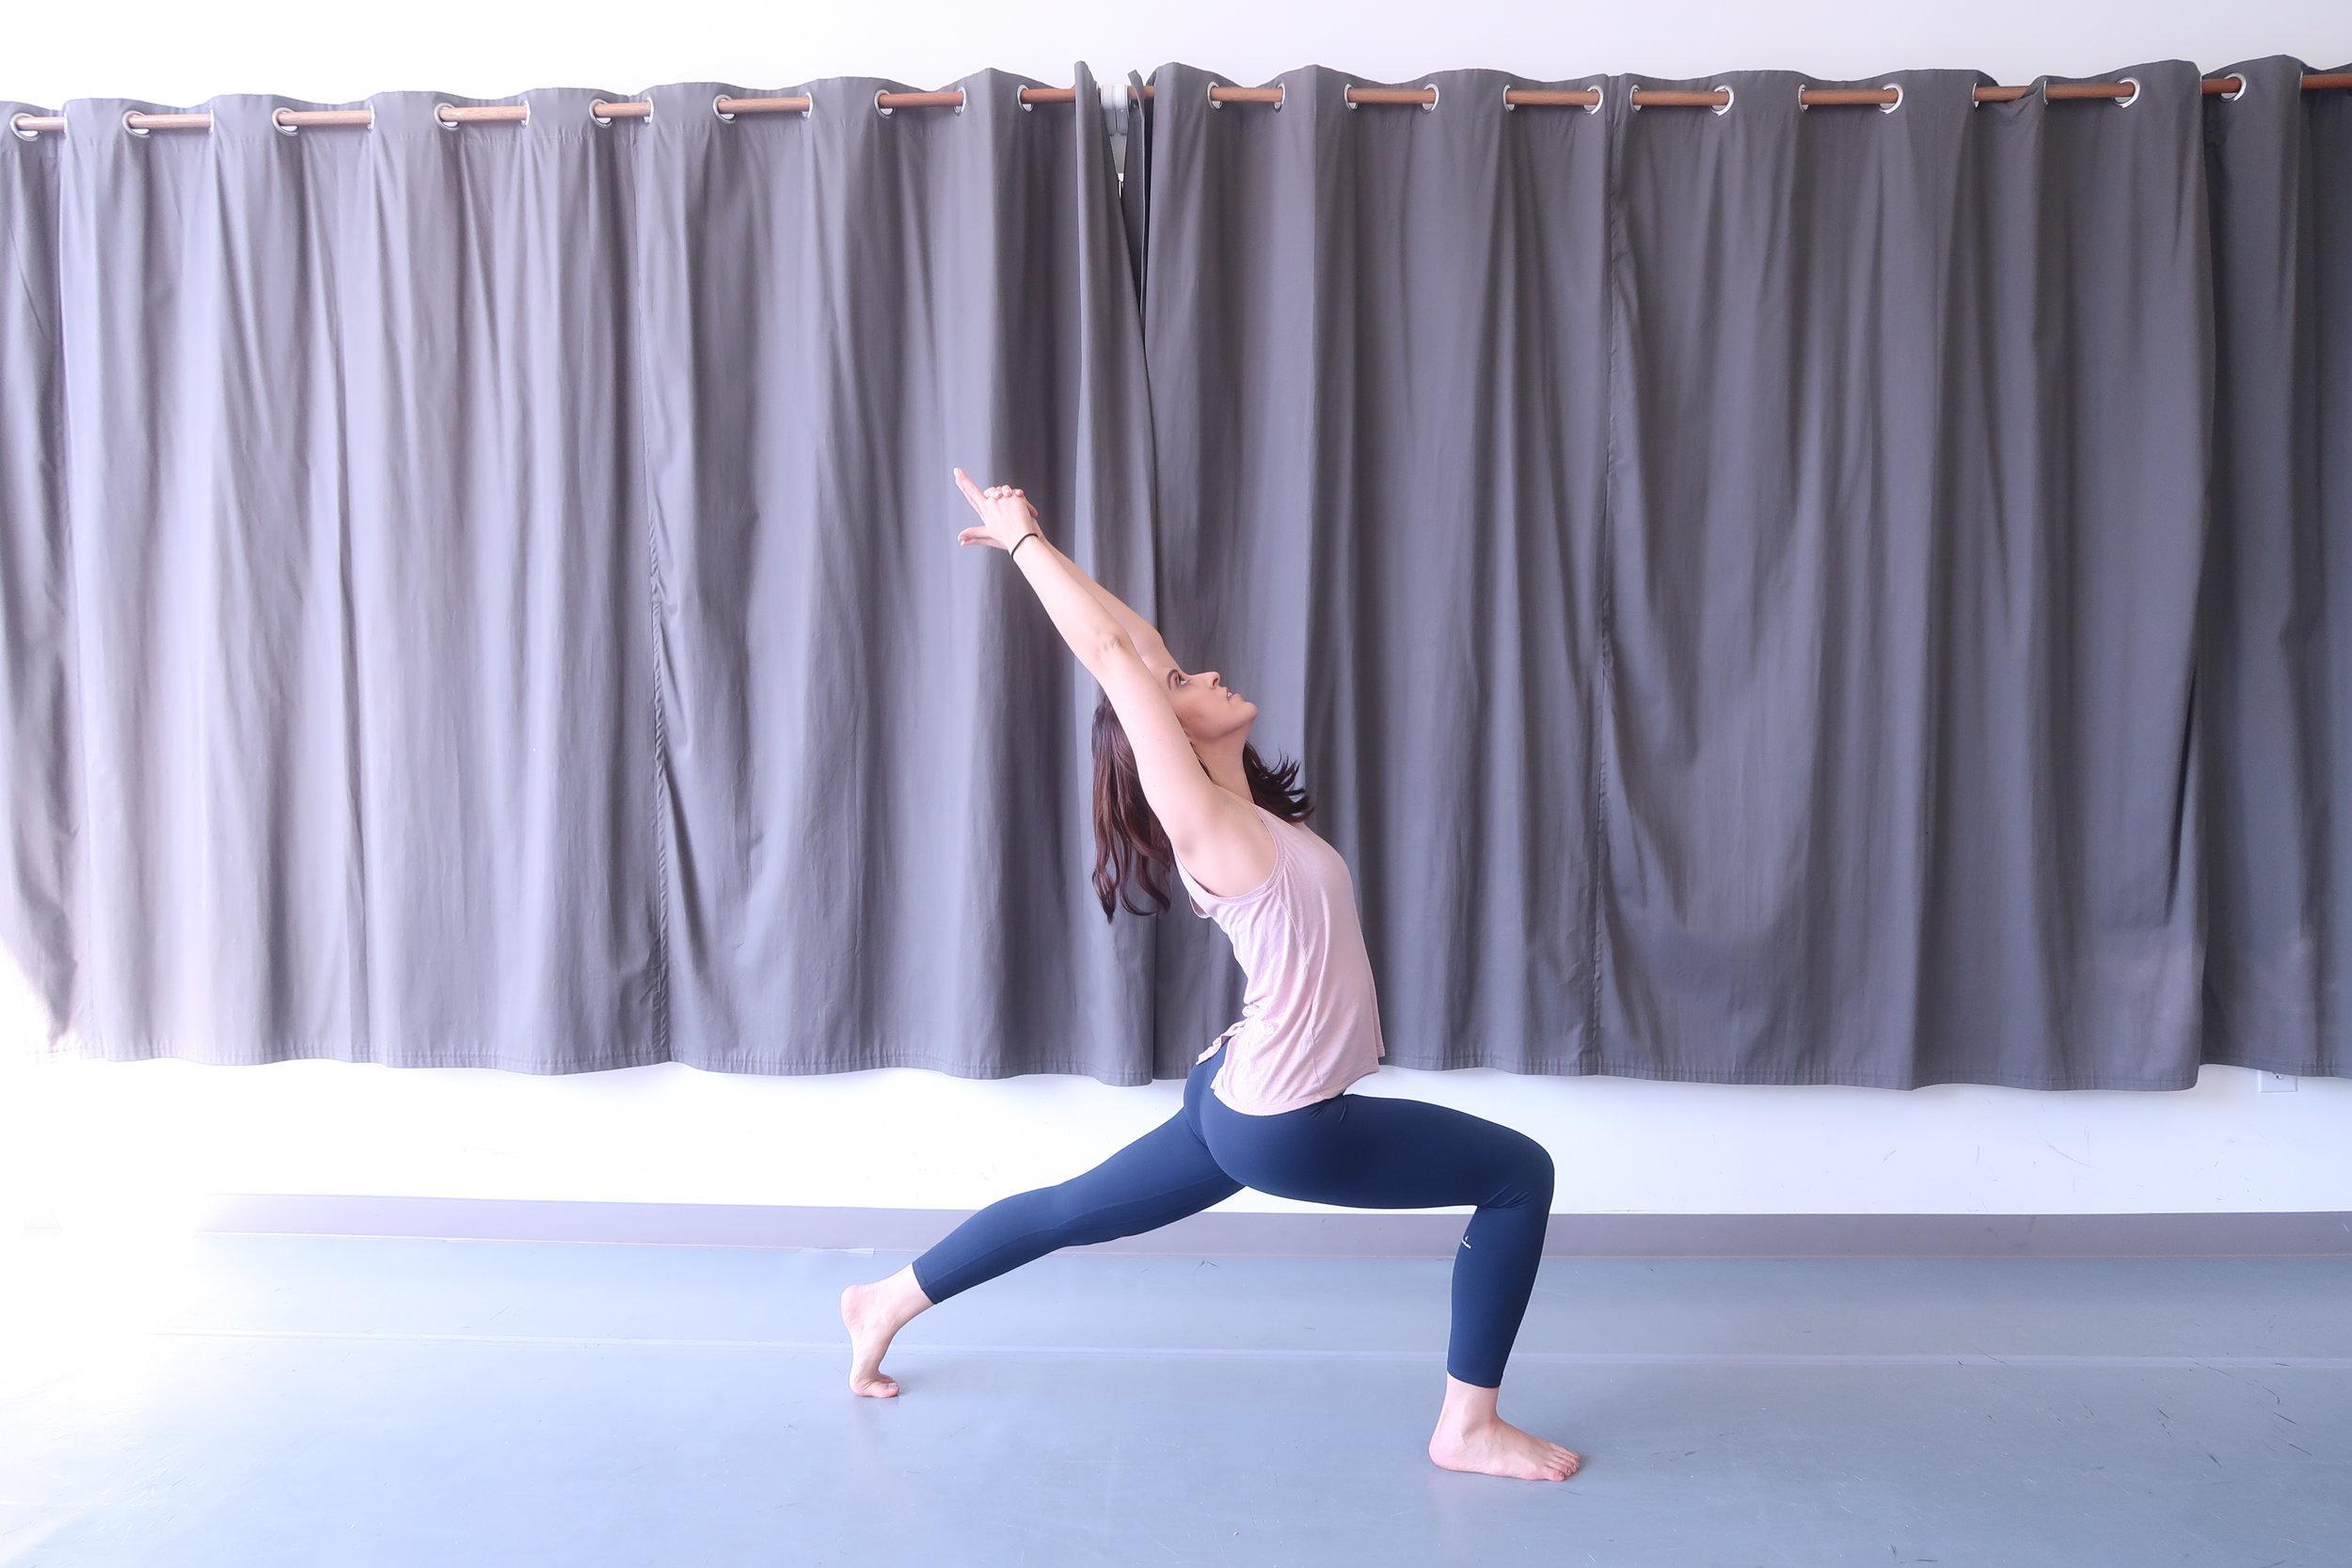 ChriskaYoga at home yoga videos - yoga on YouTube - Free Online Yoga Classes